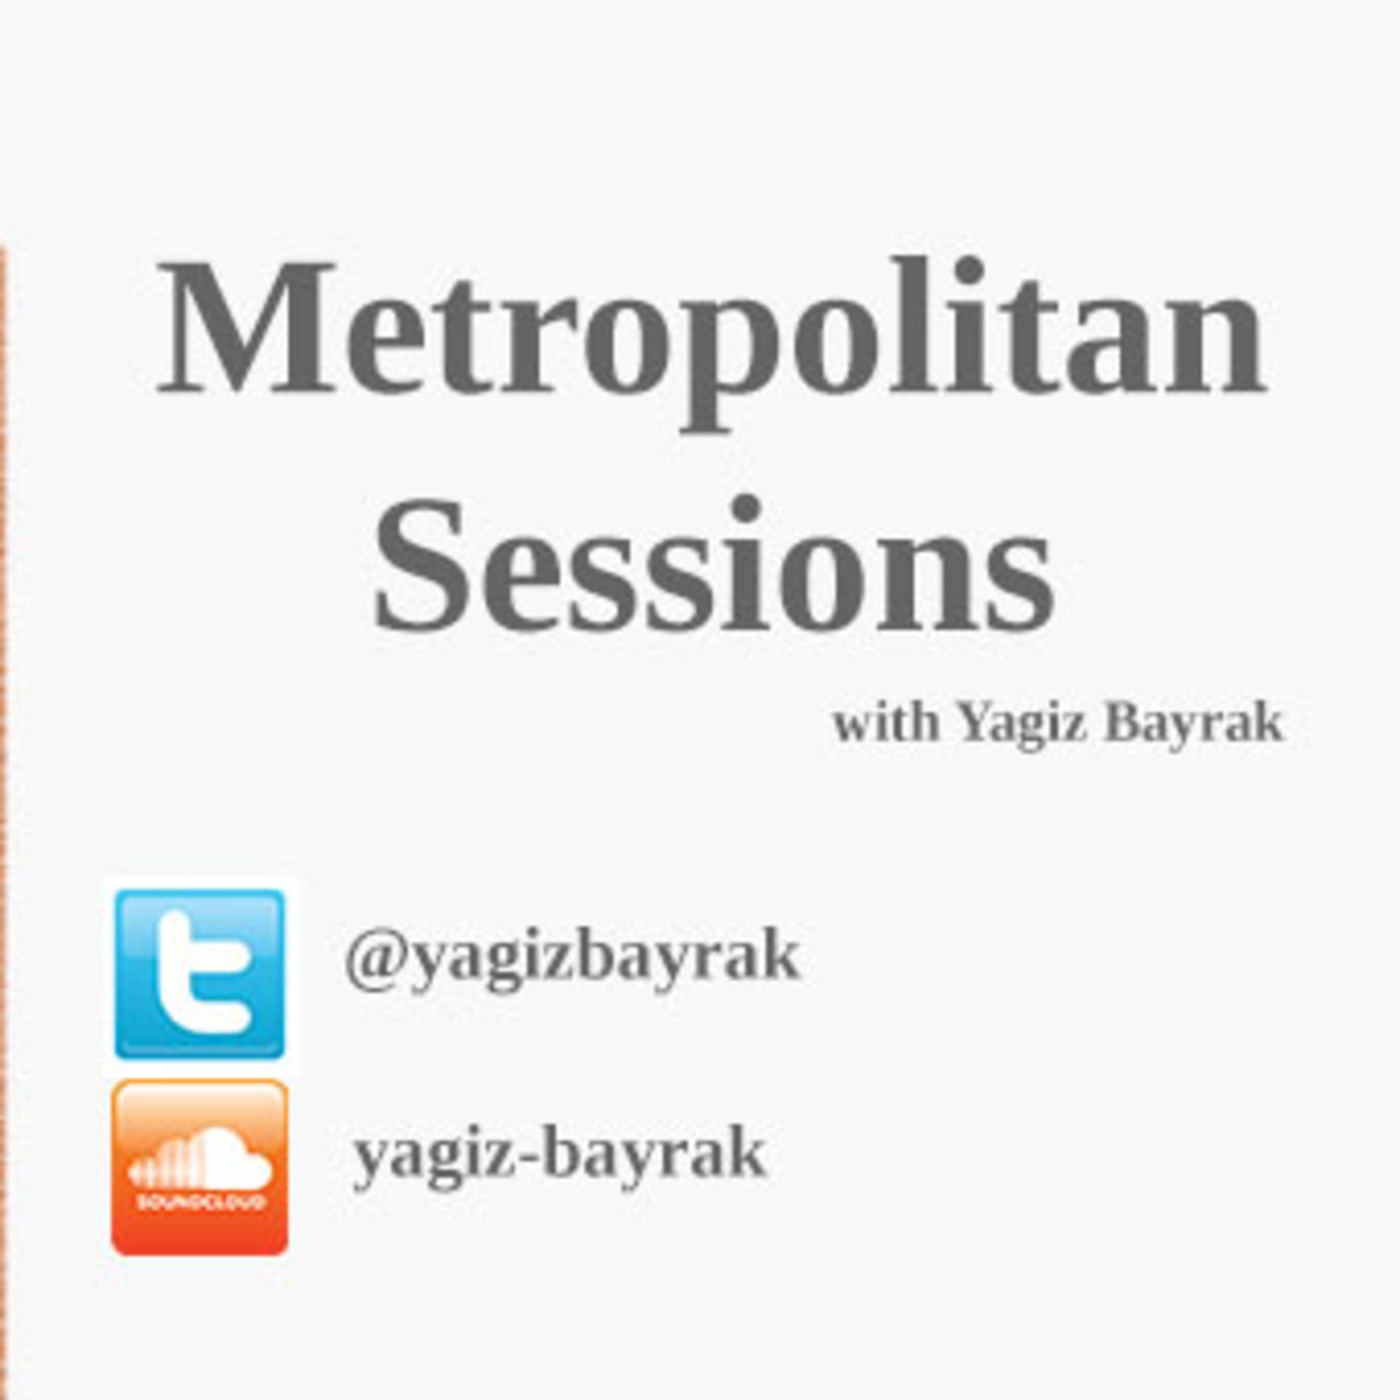 Metropolitan Sessions